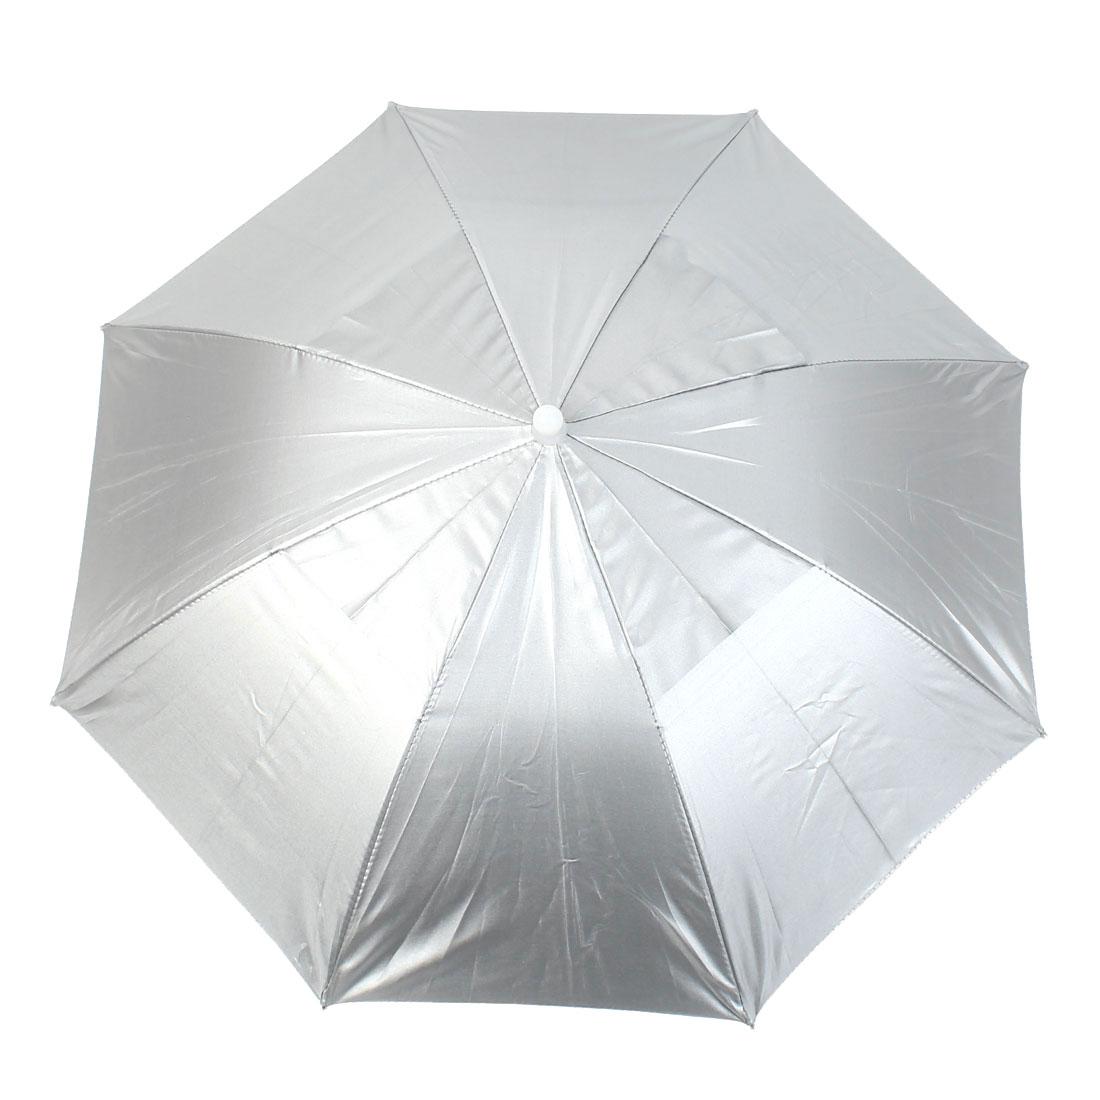 "25"" Dia Foldable Headwear Sun Rain Umbrella Hat Cap Silver Tone"